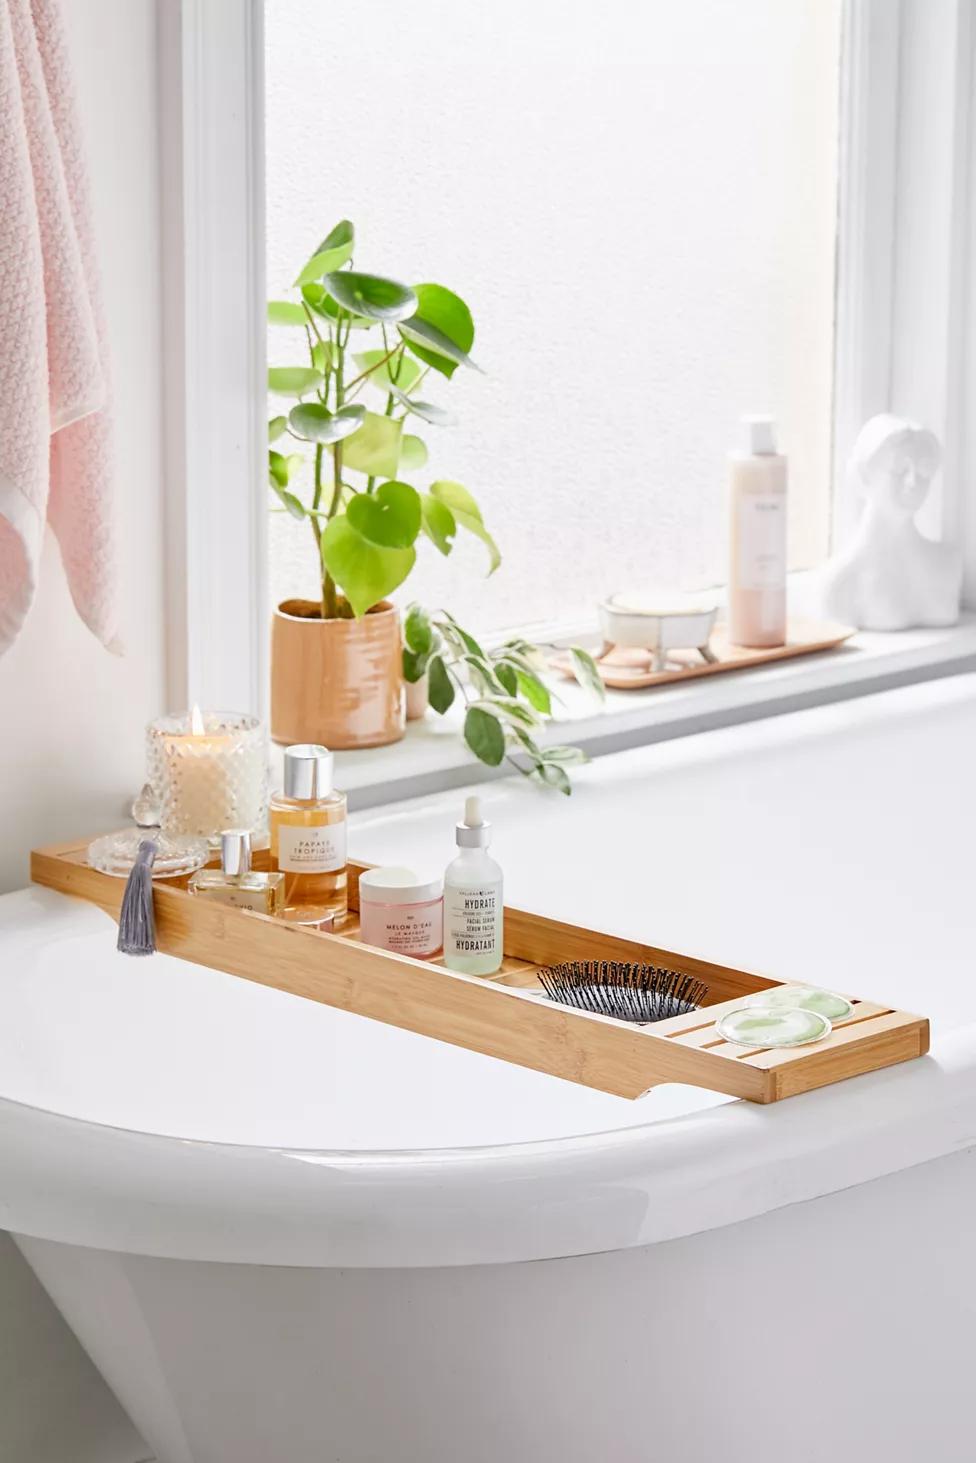 Bamboo Bath Tray Caddy Bath Tray Bath Tray Caddy Bathtub Tray [ 1463 x 976 Pixel ]